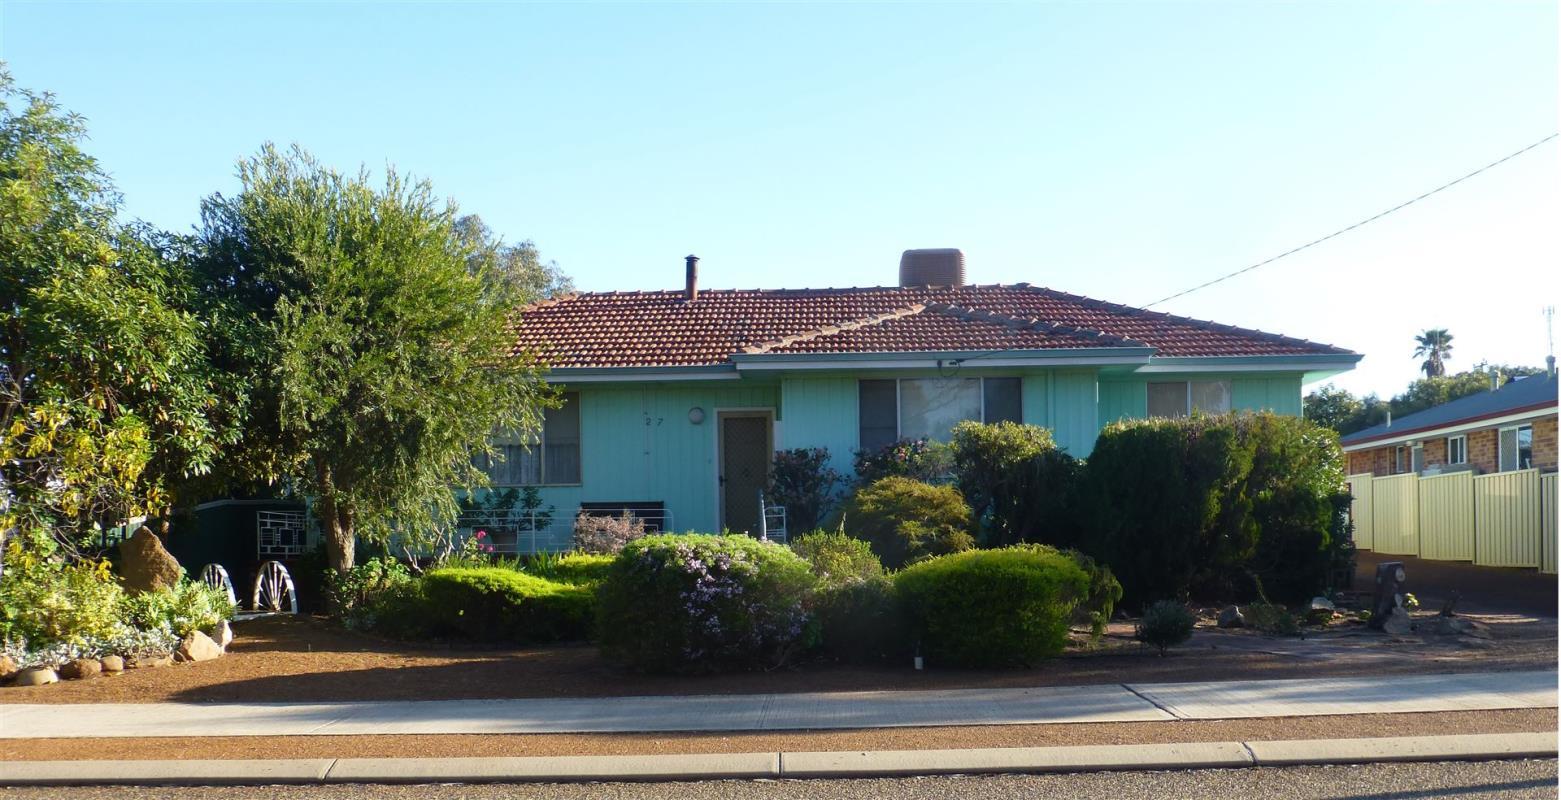 27-seimons-avenue-corrigin-6375-wa